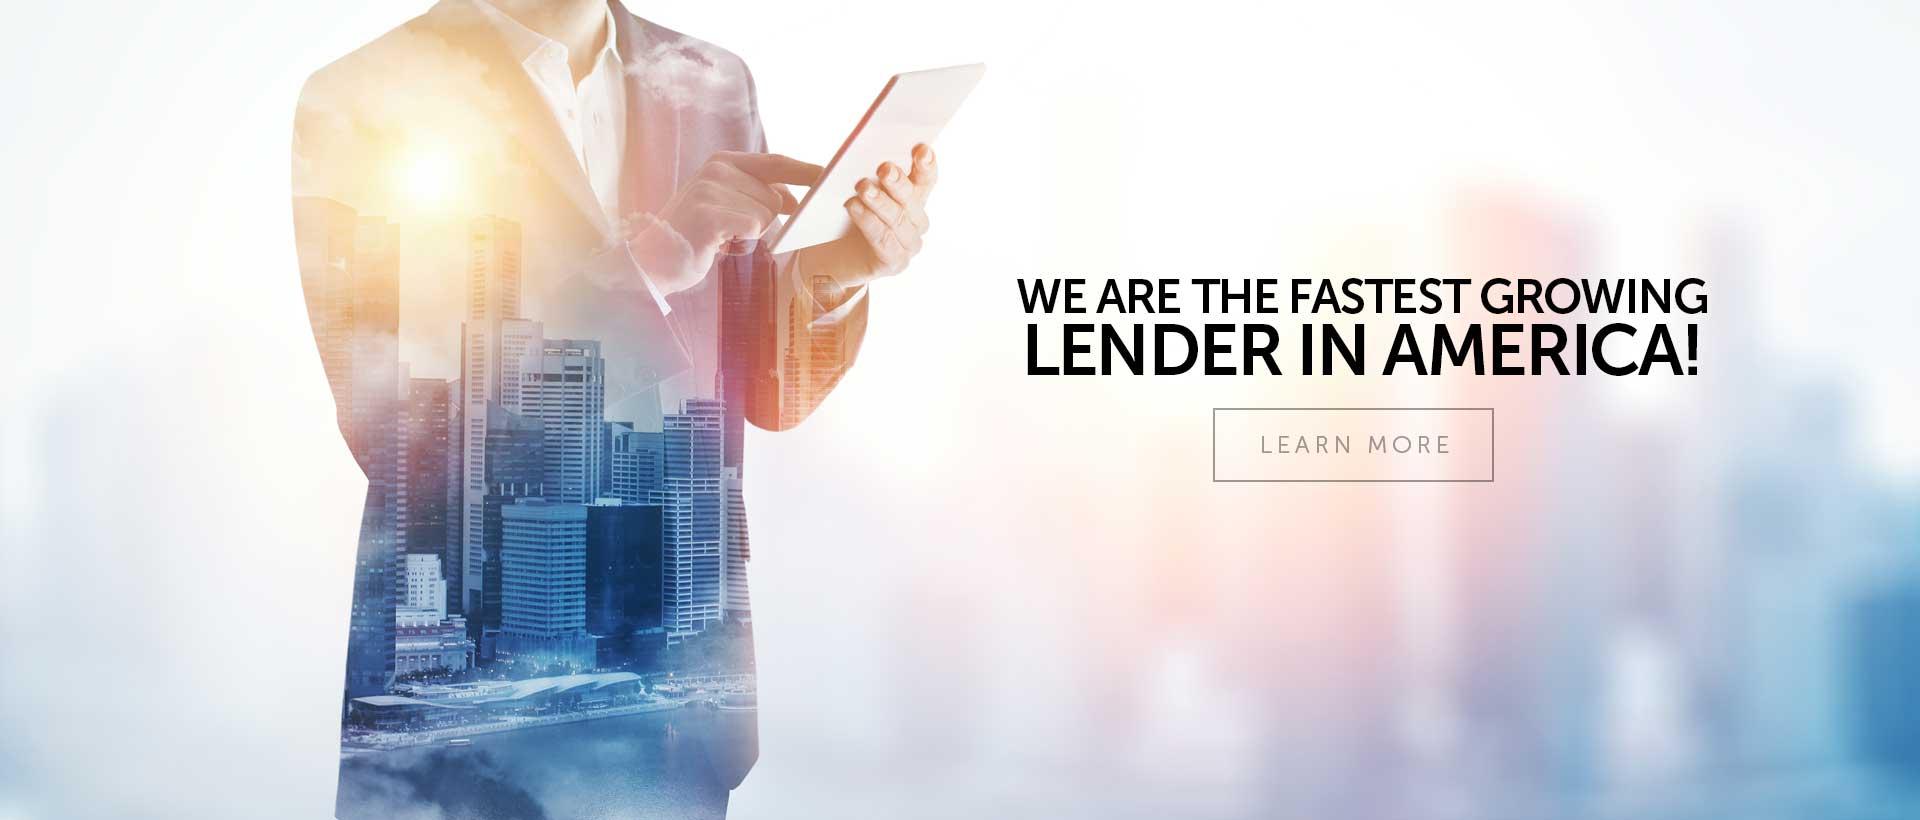 Lender in America